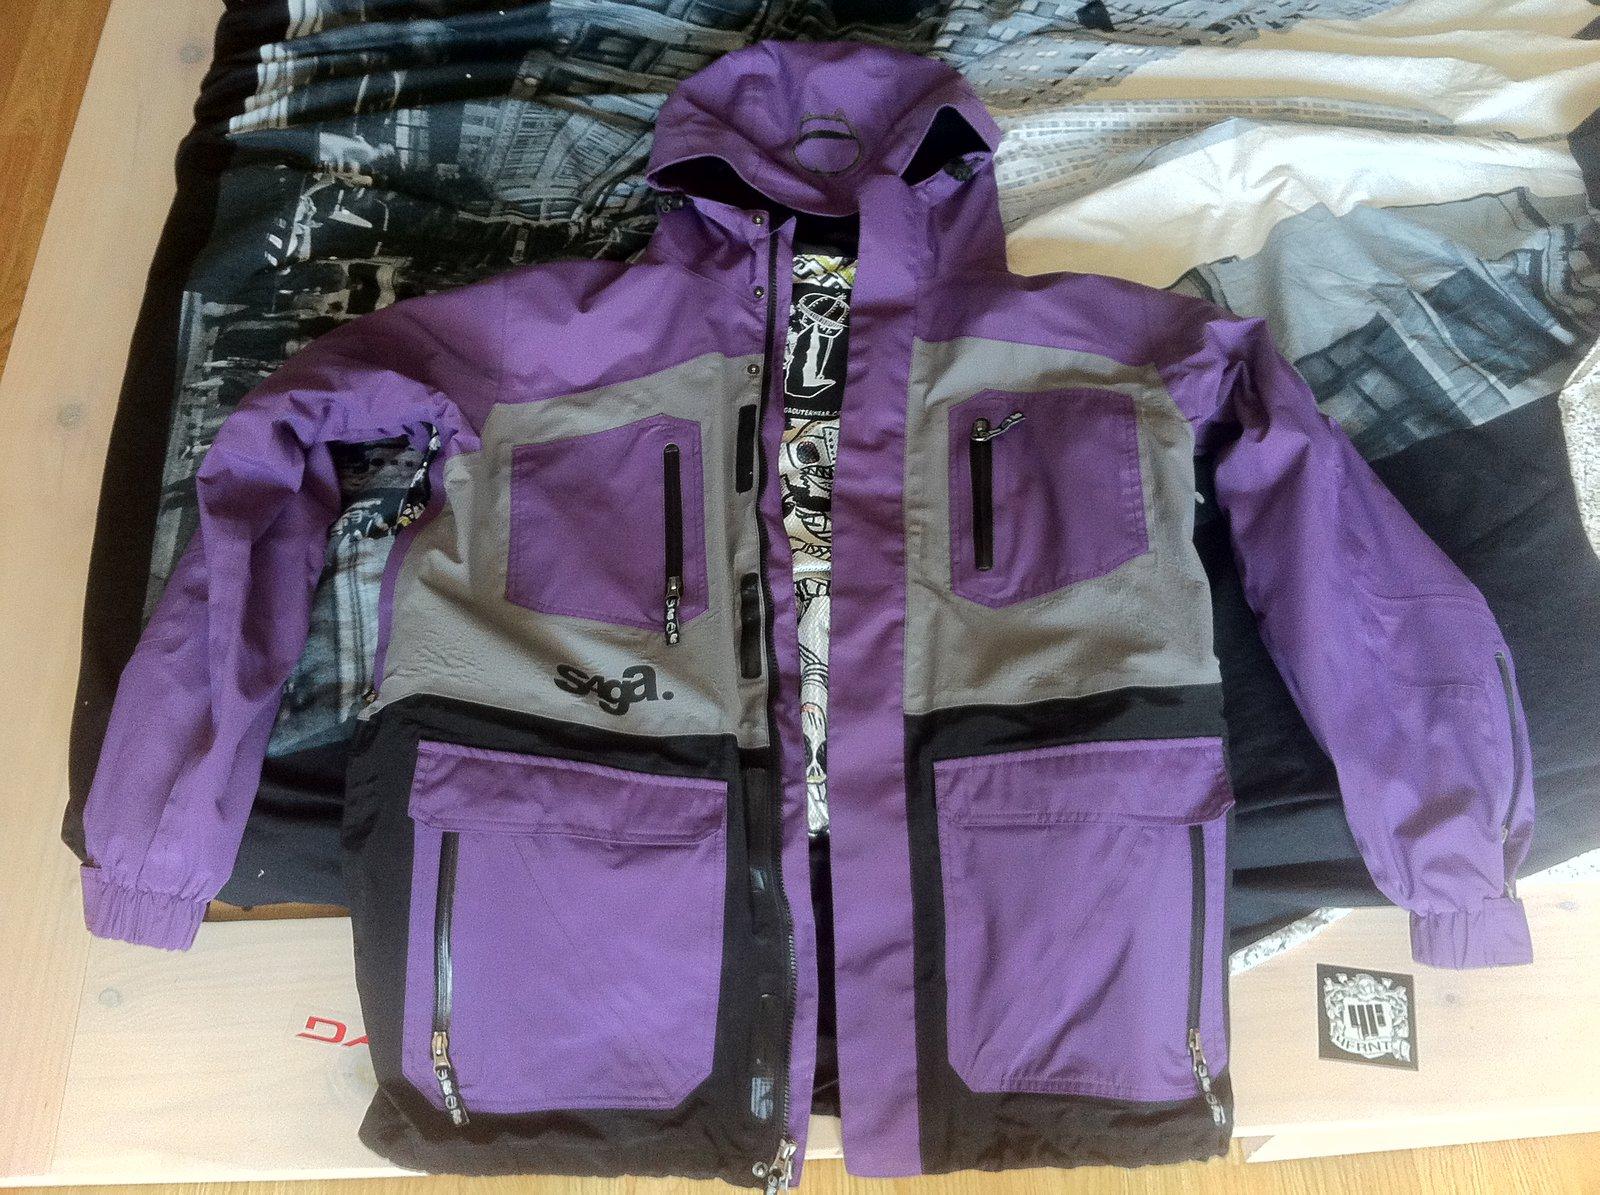 Jacket front